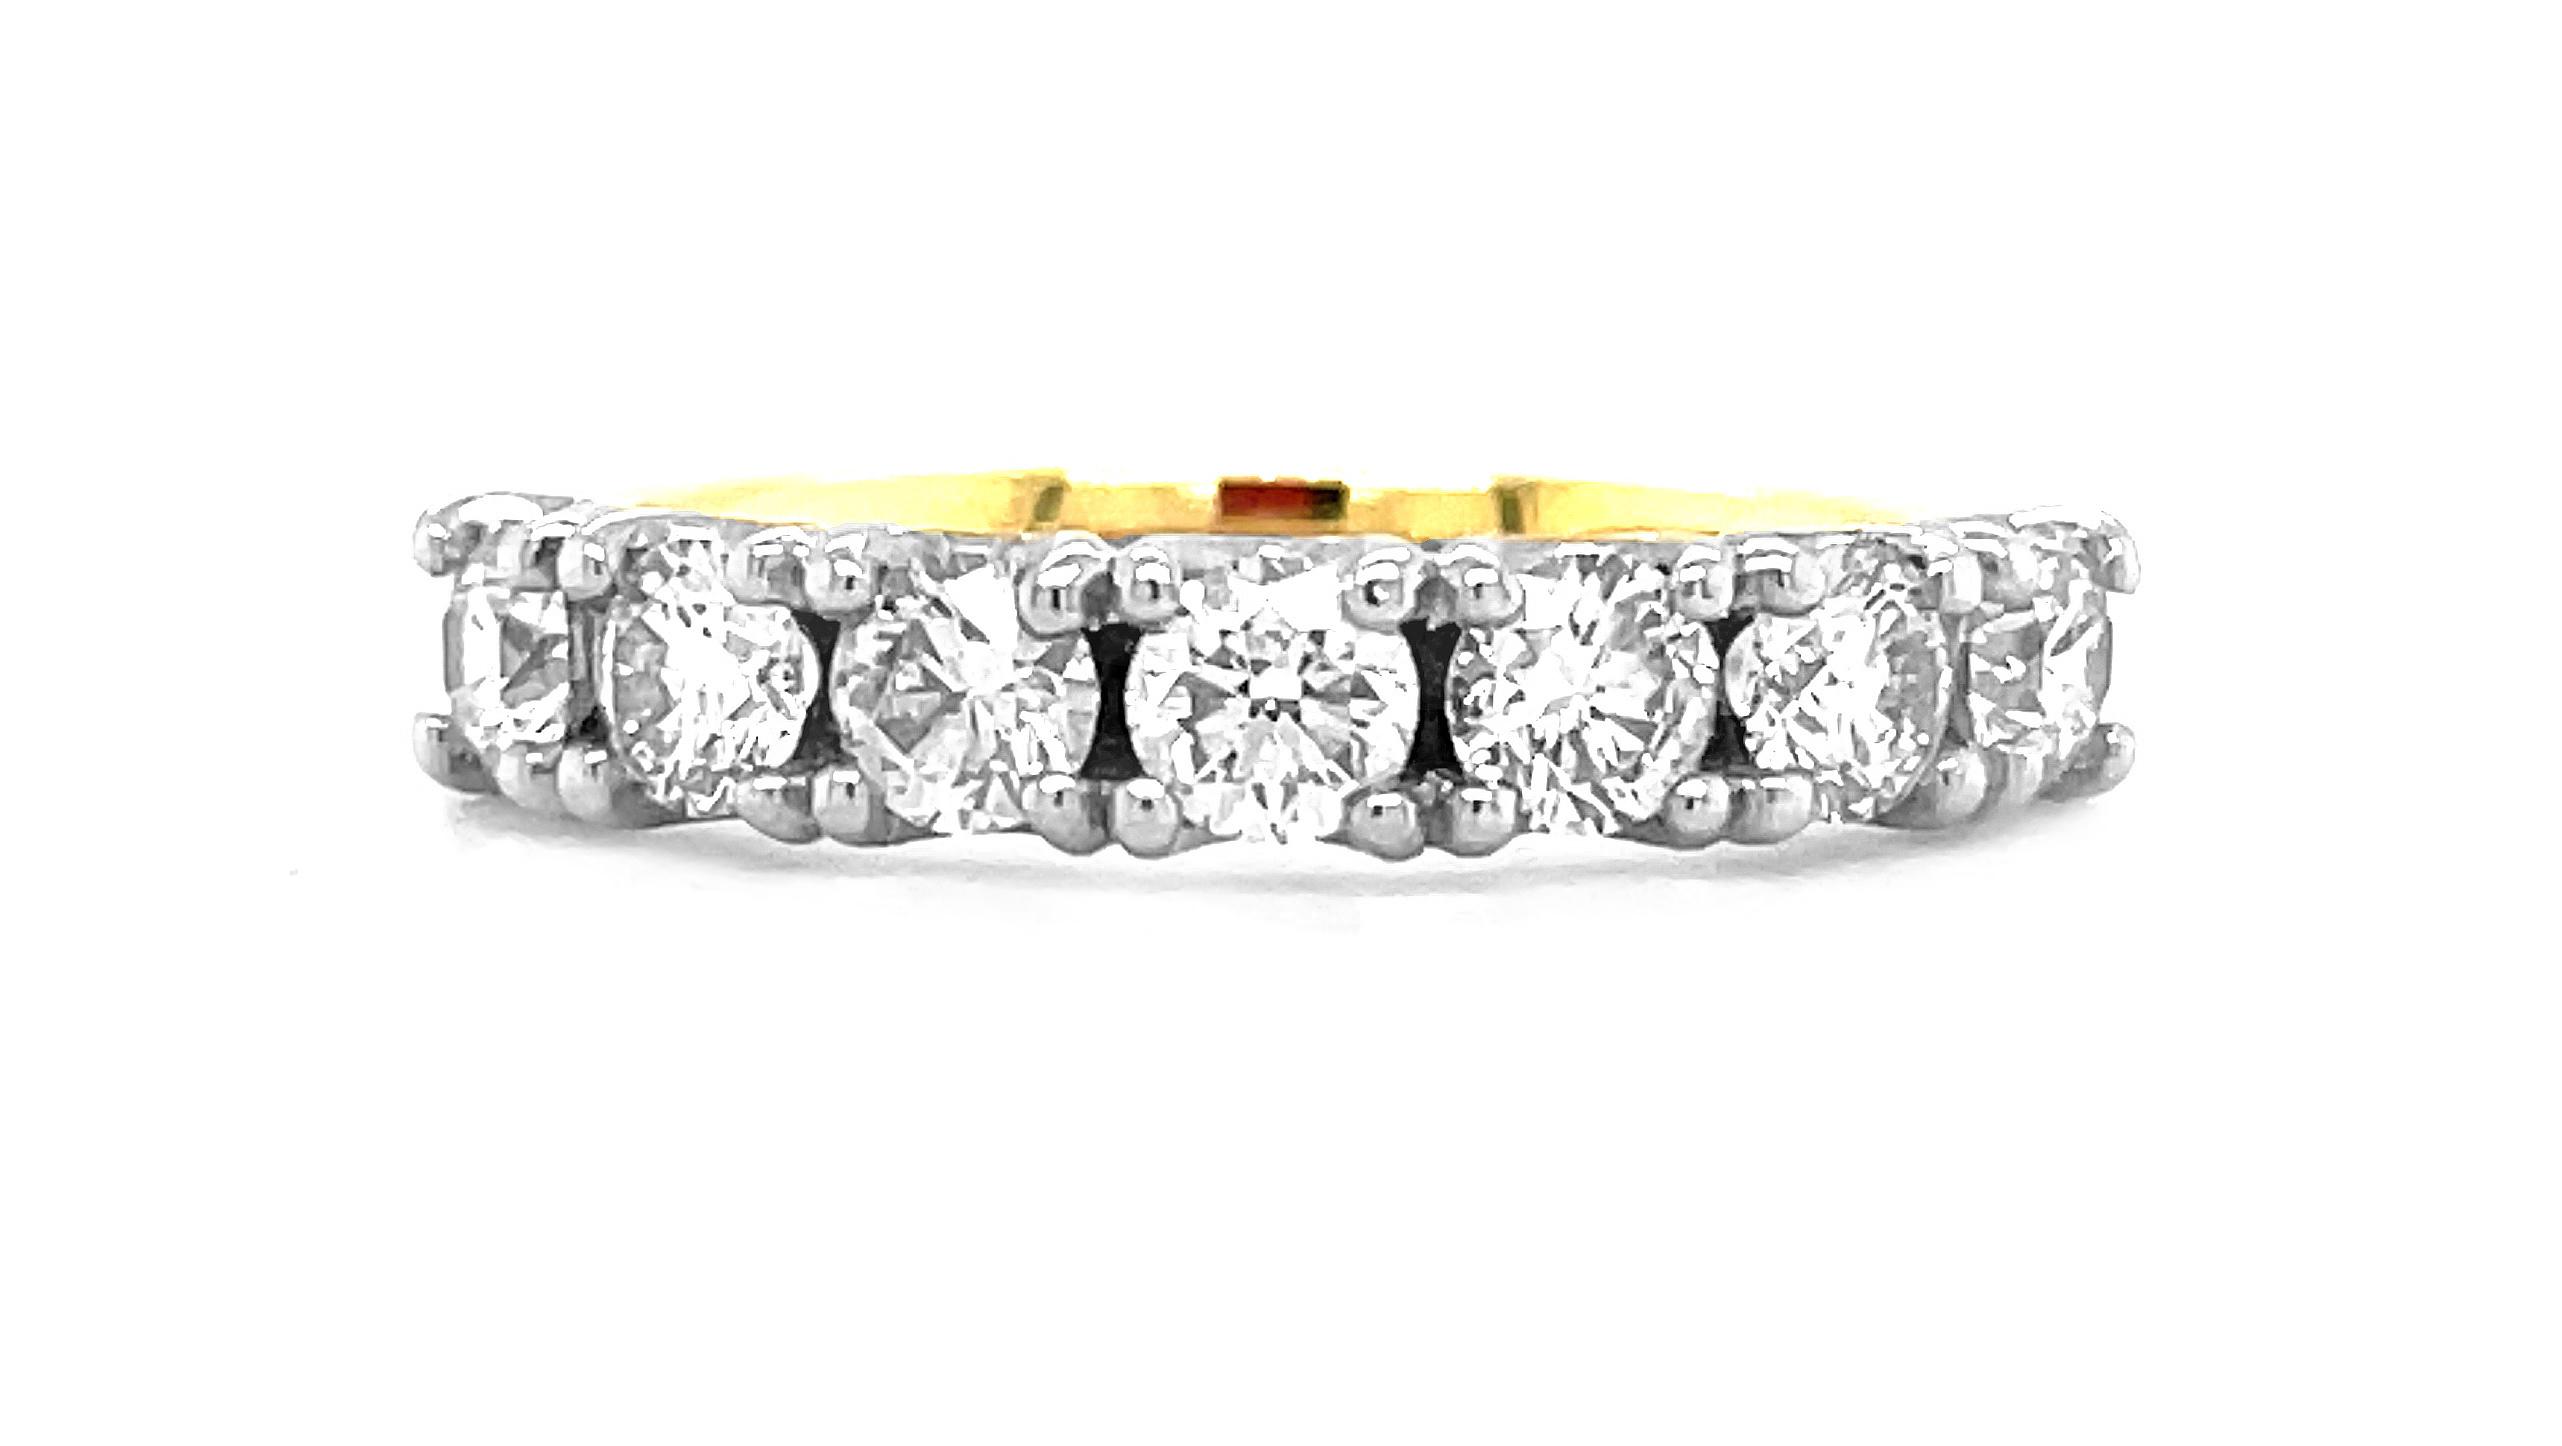 Platinum & 18k Yellow Gold 7 Stone Brilliant Cut Diamond Ring